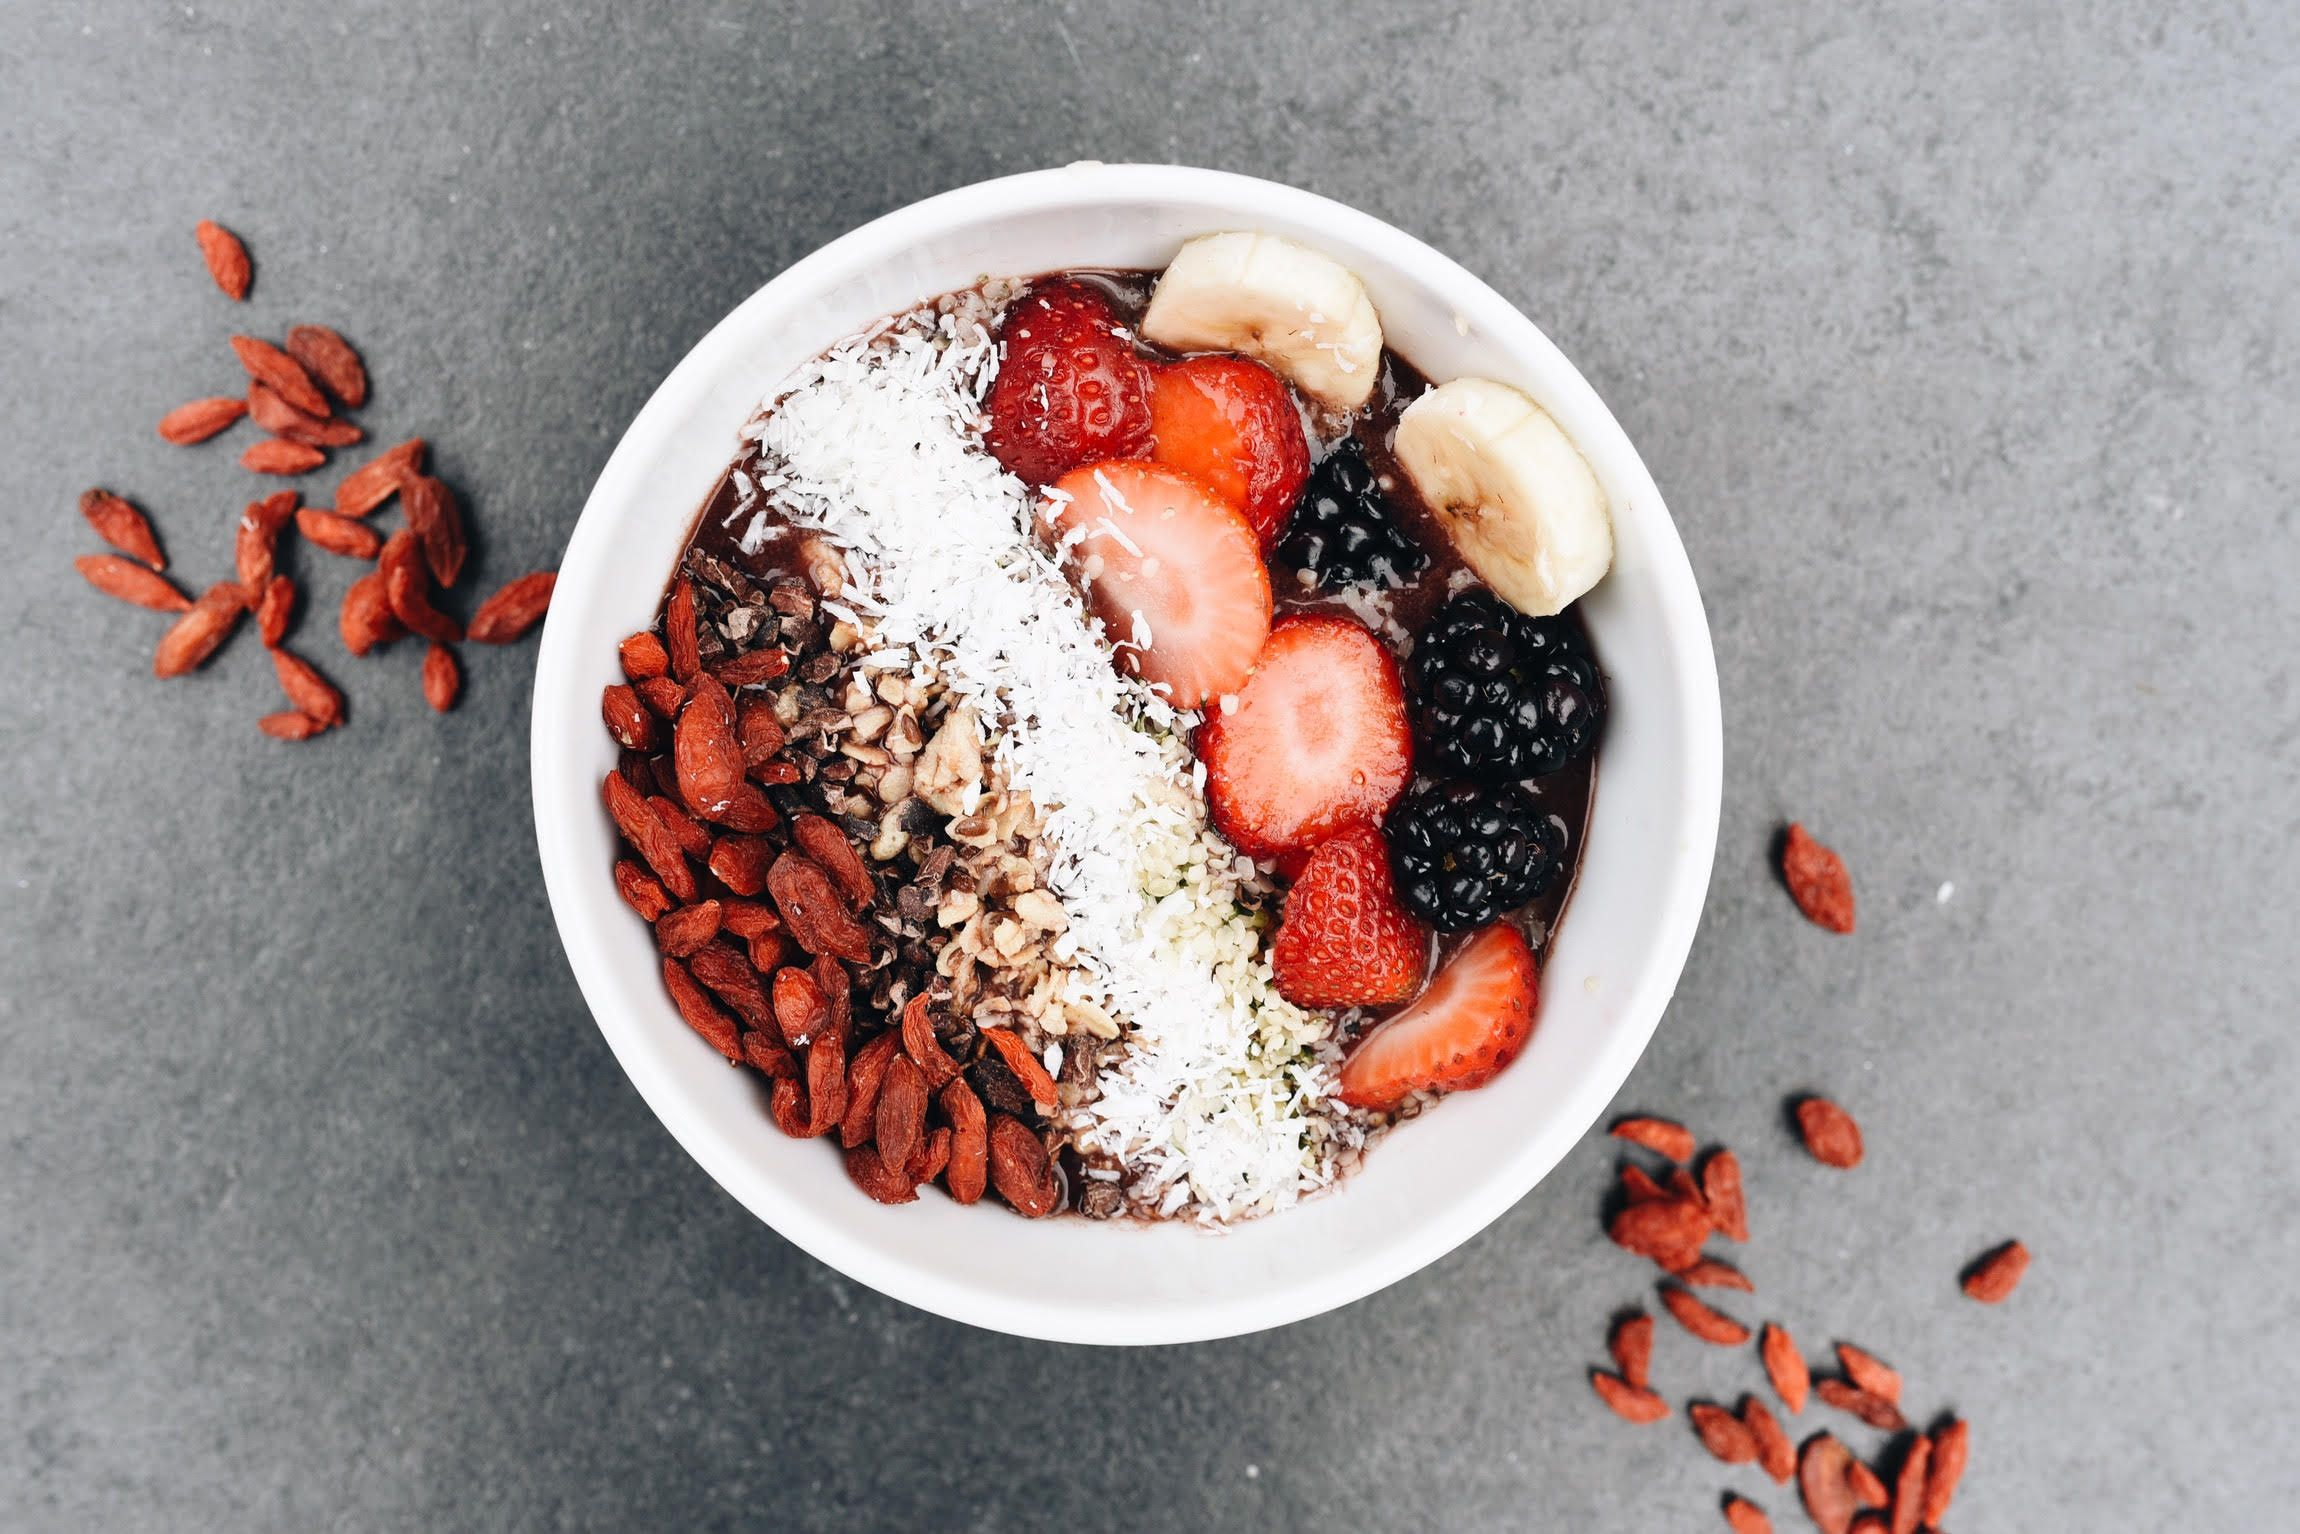 La tendance food qui affole Instagram